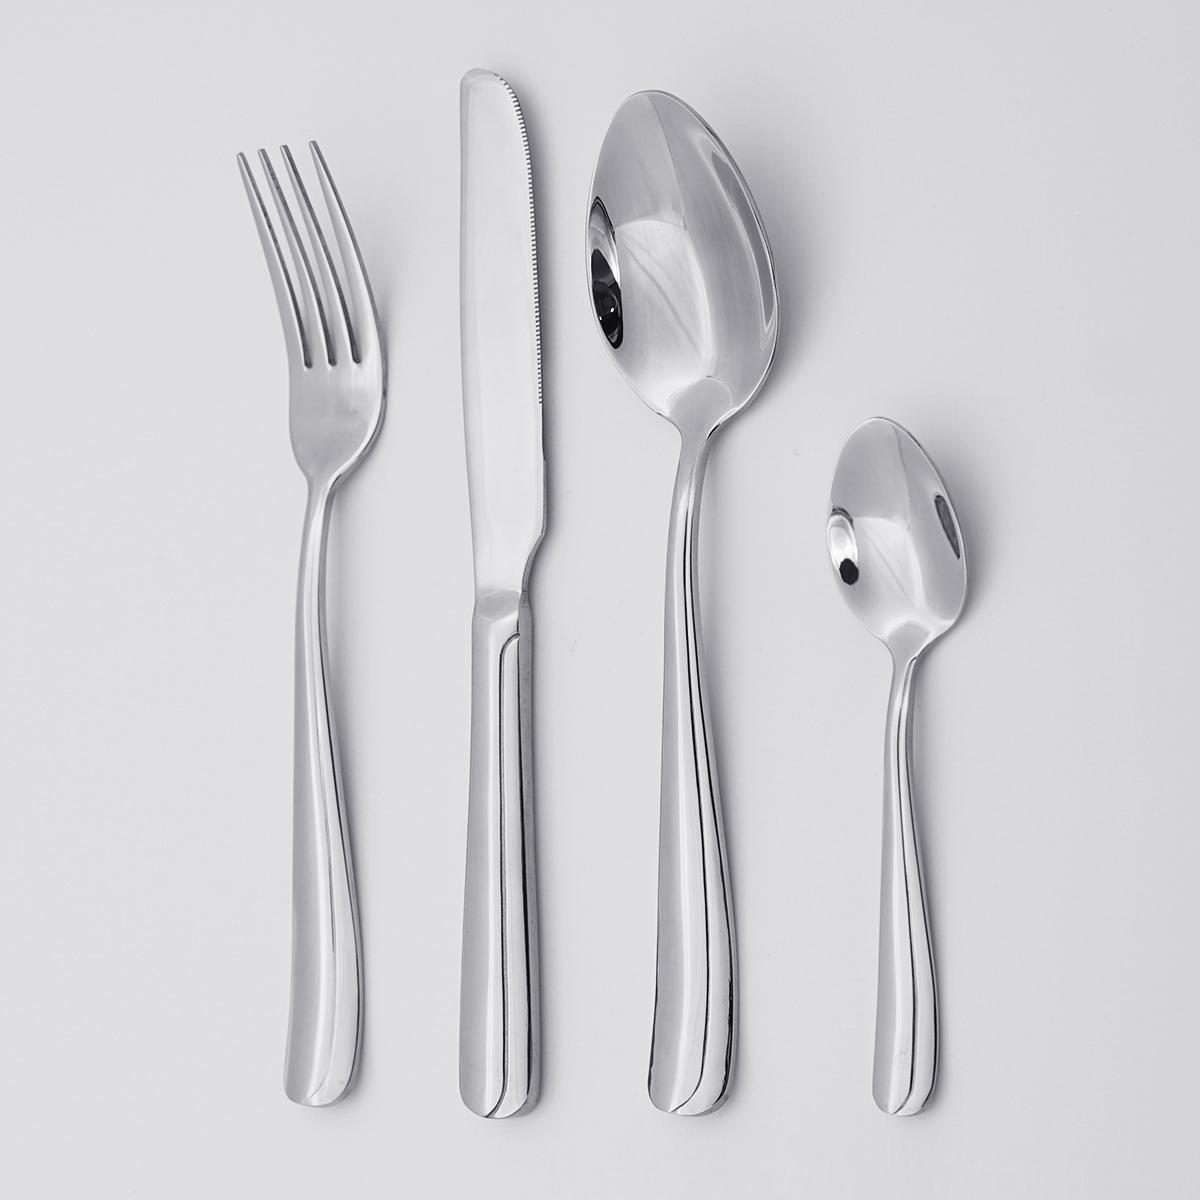 Wholesale Modern Italian Silverware 18/8 Stainless Steel Cutlery Set Exquisite 4pcs Silverware Flatware